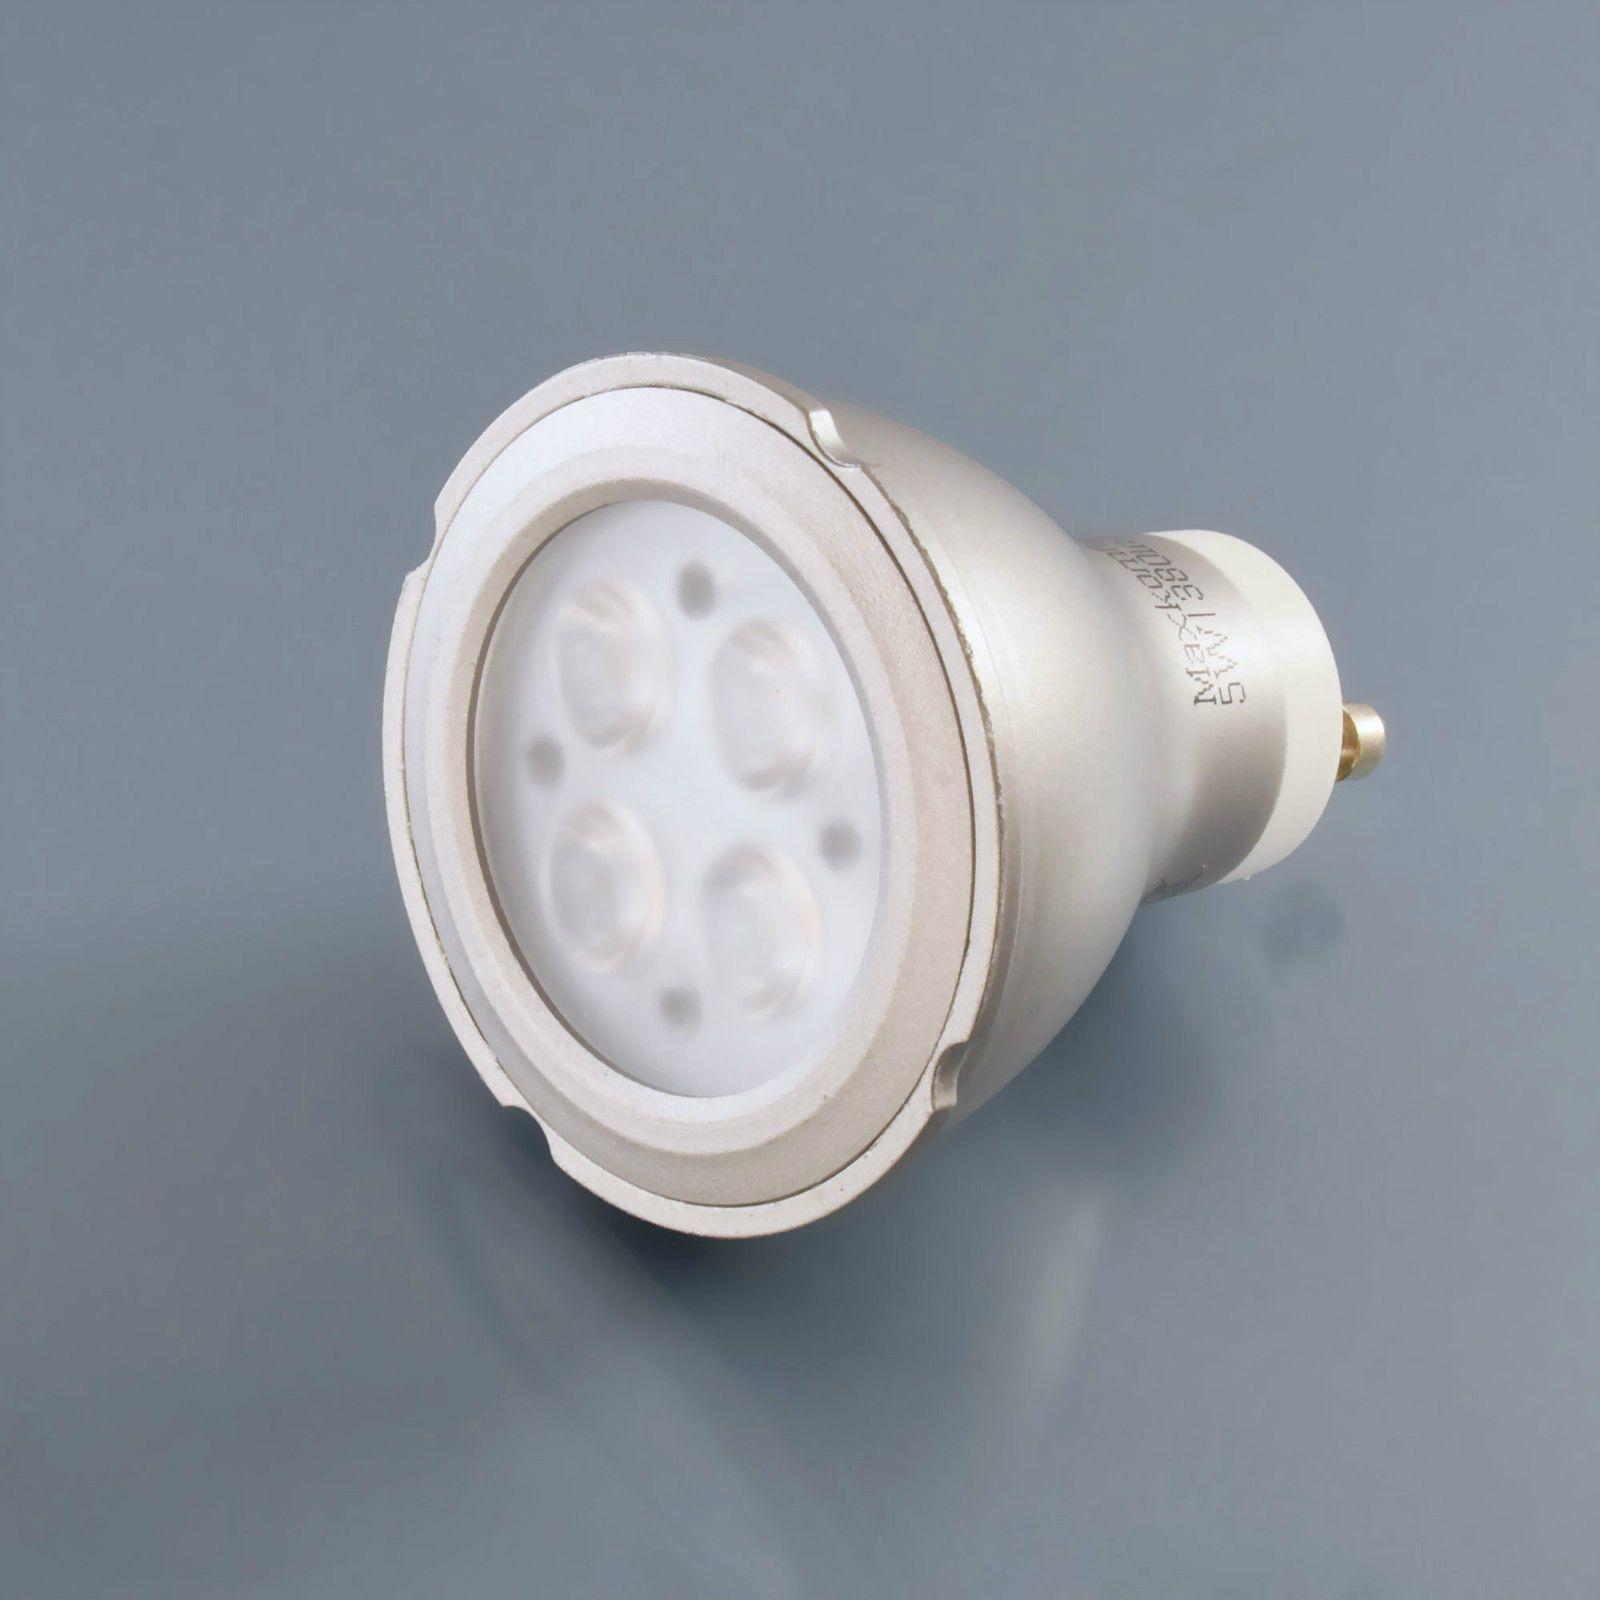 Details Zu Led Gu10 Lampe Leuchtmittel Strahler Spot Birne